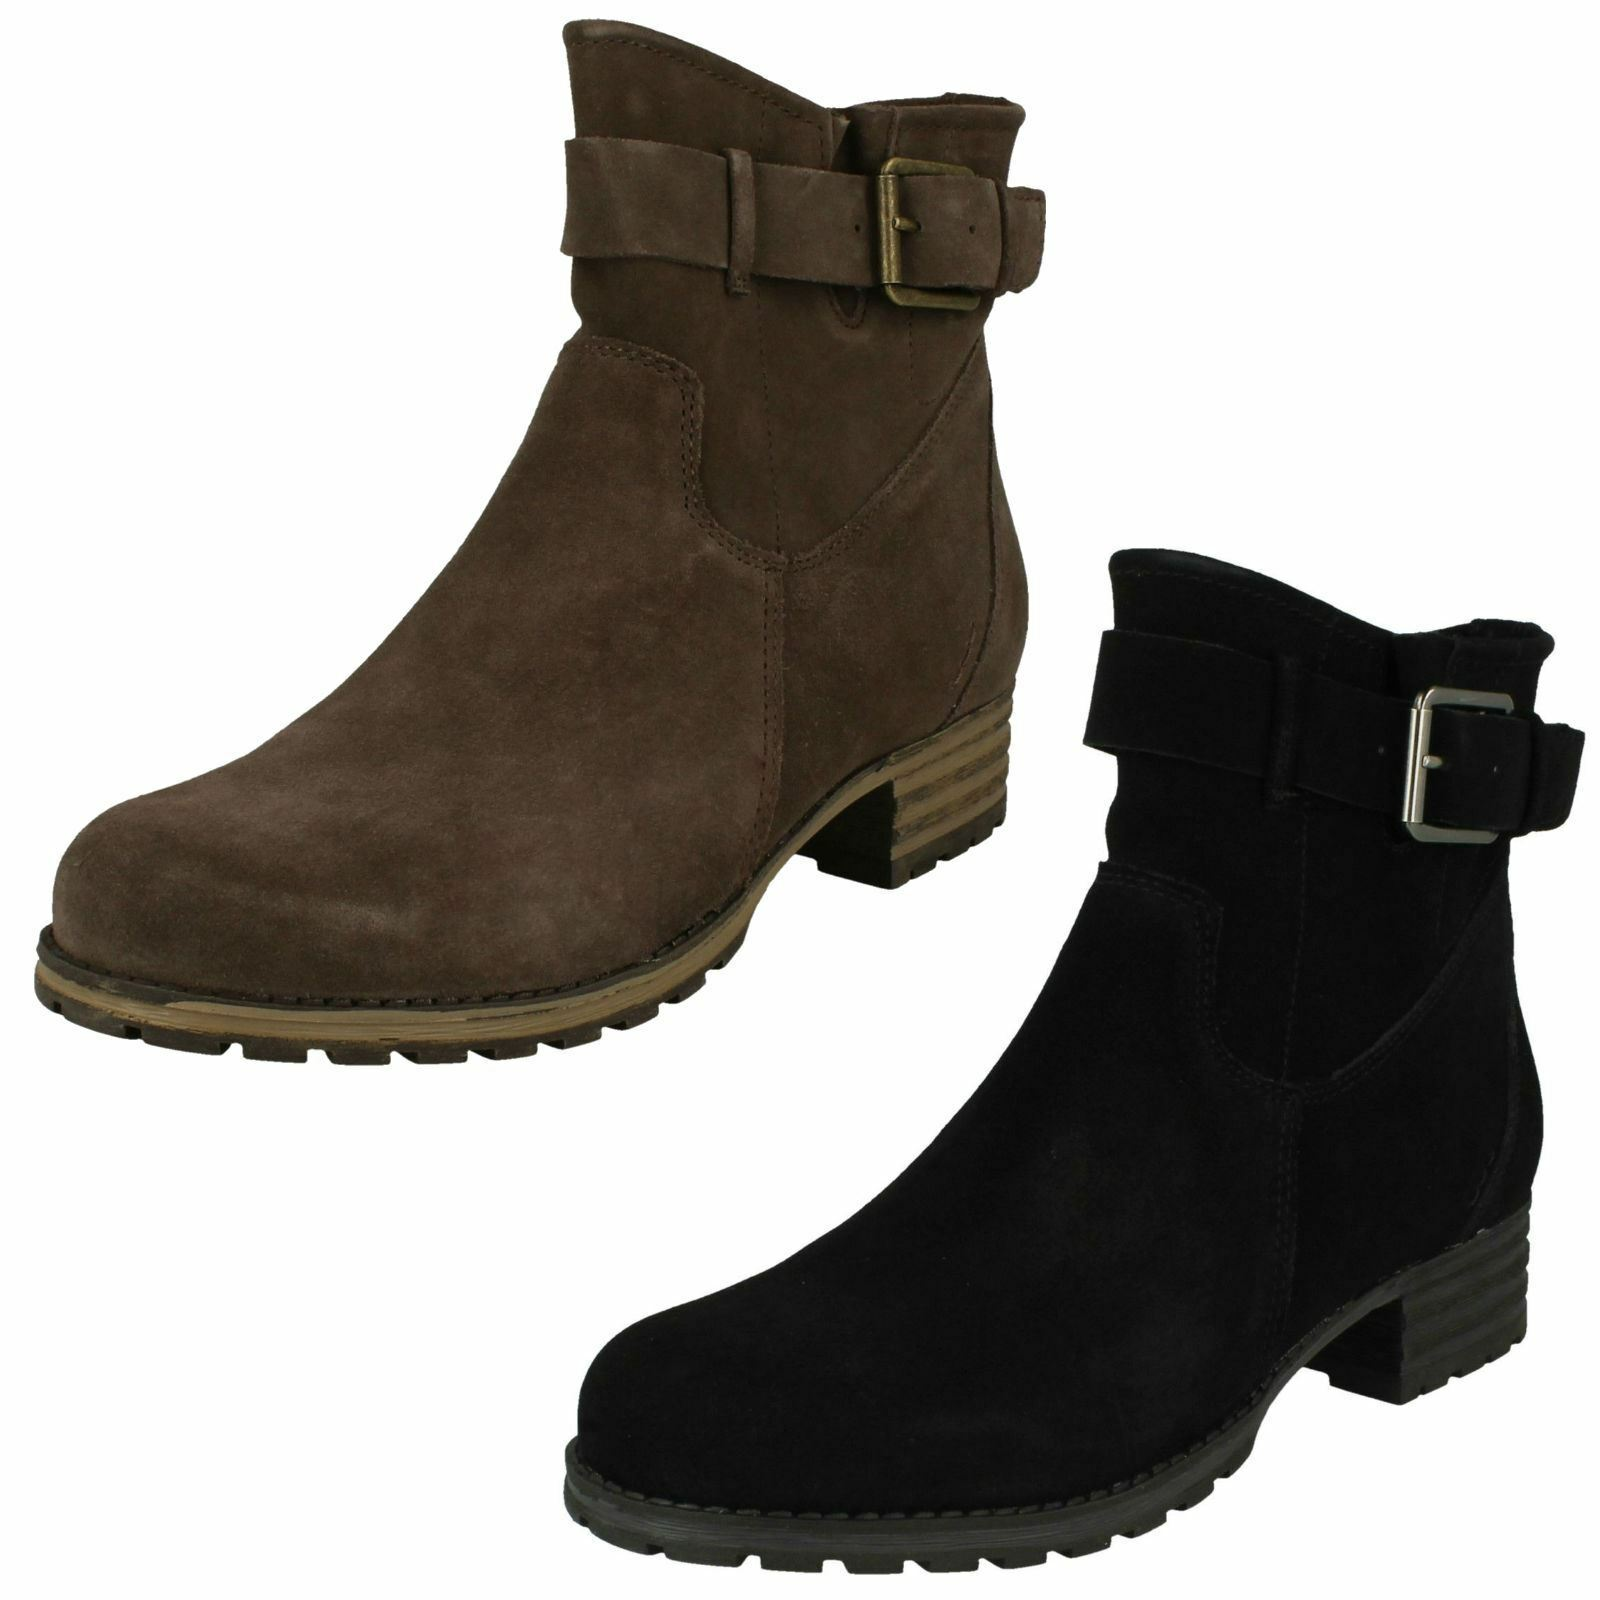 Damas Clarks Inteligente Inteligente Inteligente Tobillo botas  Marana ámbar   ventas en linea